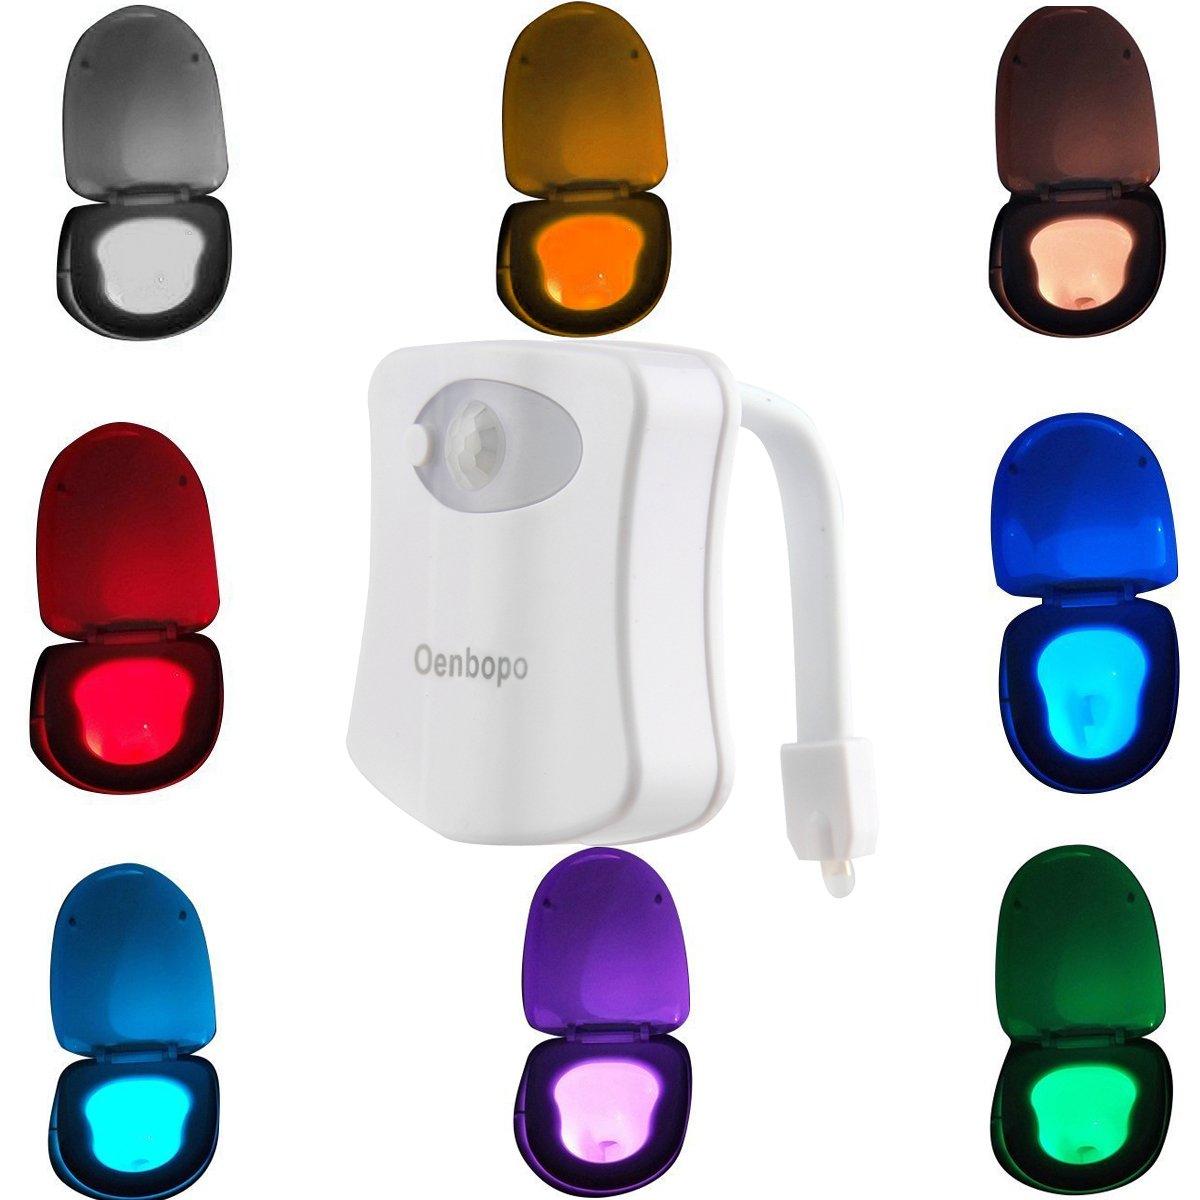 Colorful Motion Sensor Toilet Nightlight Oenbopo Home Toilet Bathroom Human B.. 14